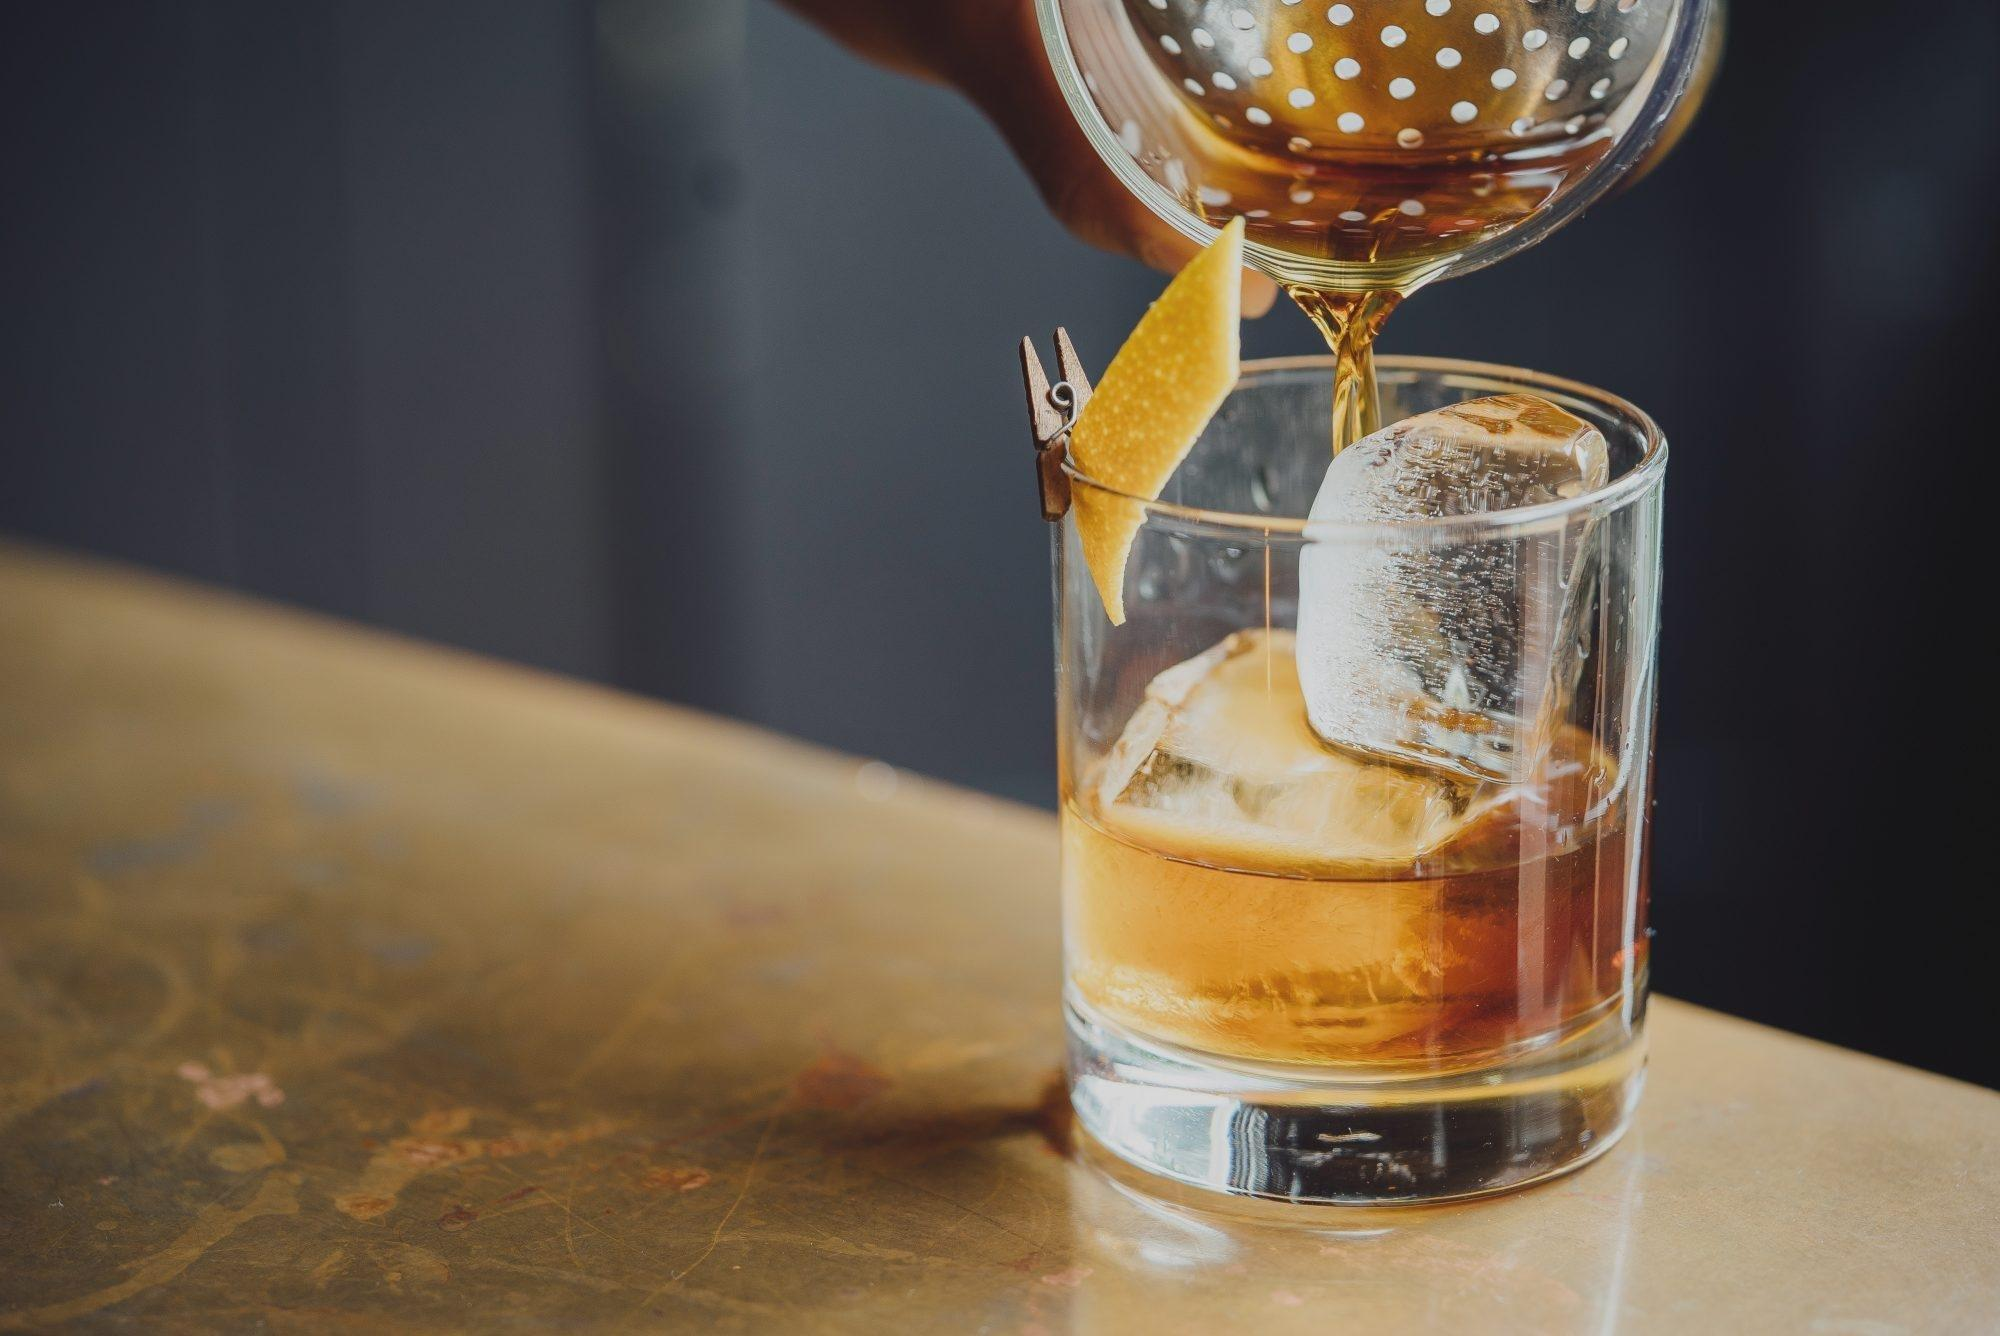 Best Alcohol For The Keto Diet | Health.com